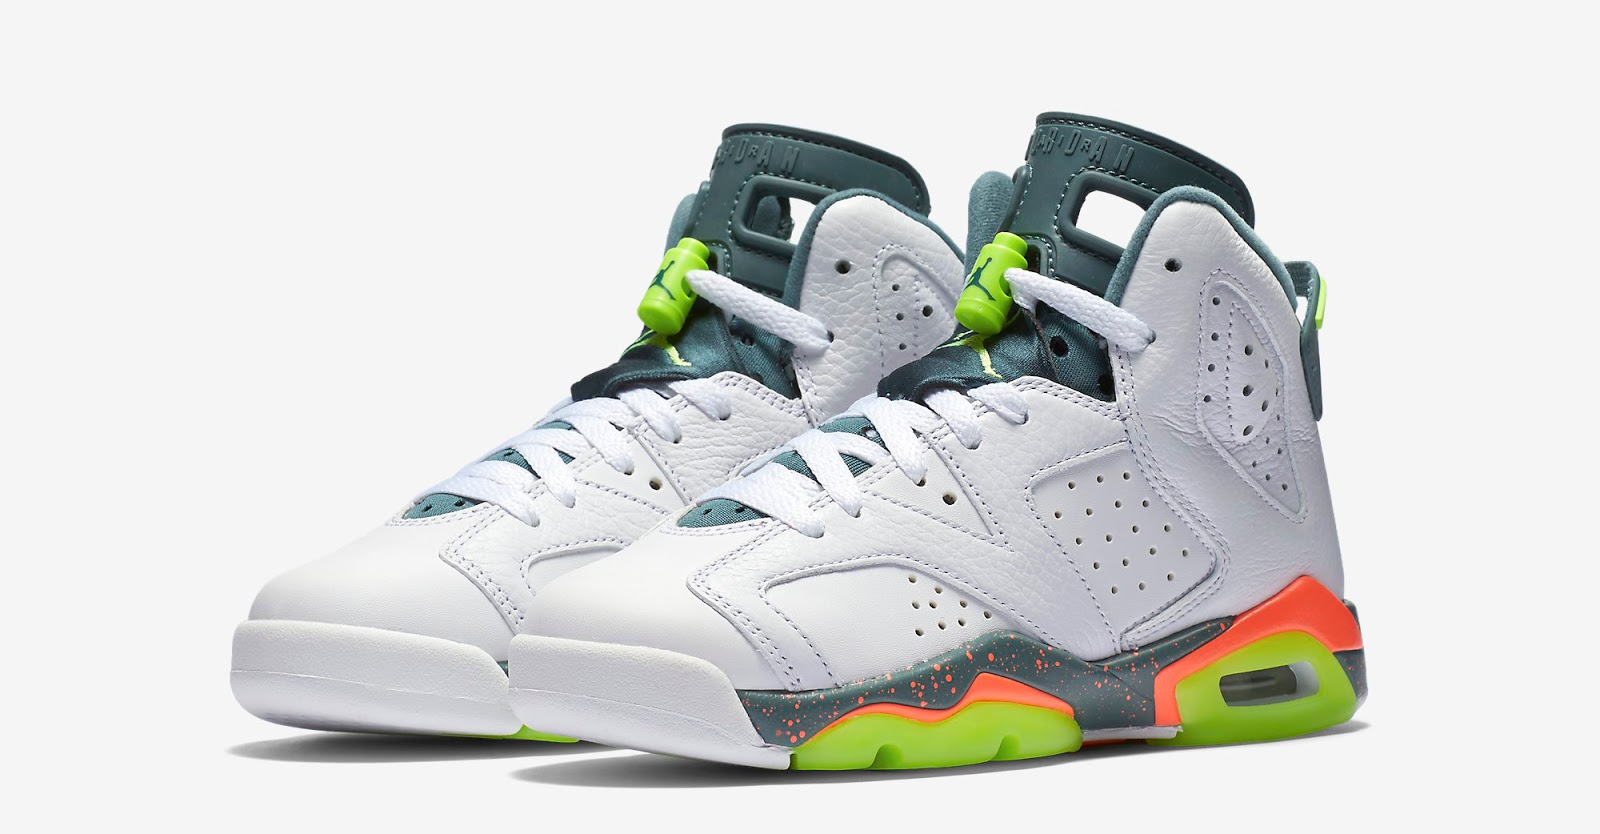 New Air Jordan 6 GS White Black Green Shoes